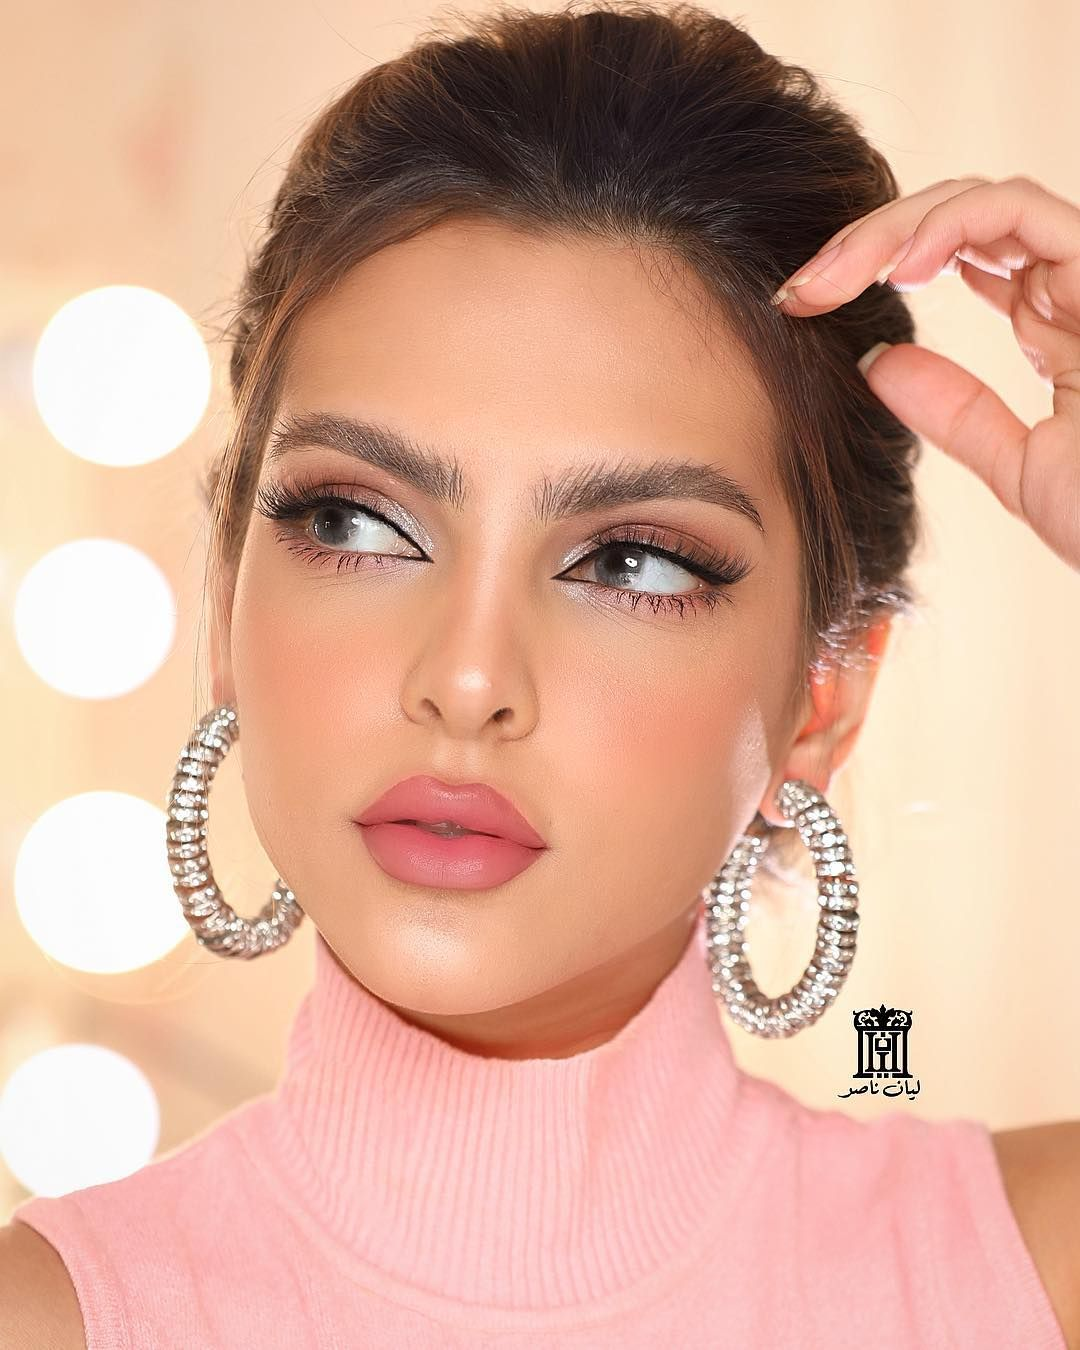 Lyan Nasser ليان ناصر On Instagram صورة ثانيه والشعر مرفوع الرموش رقم 12 Lyancosmeti Bridal Makeup Looks Stylish Girl Images Beautiful Girl Image